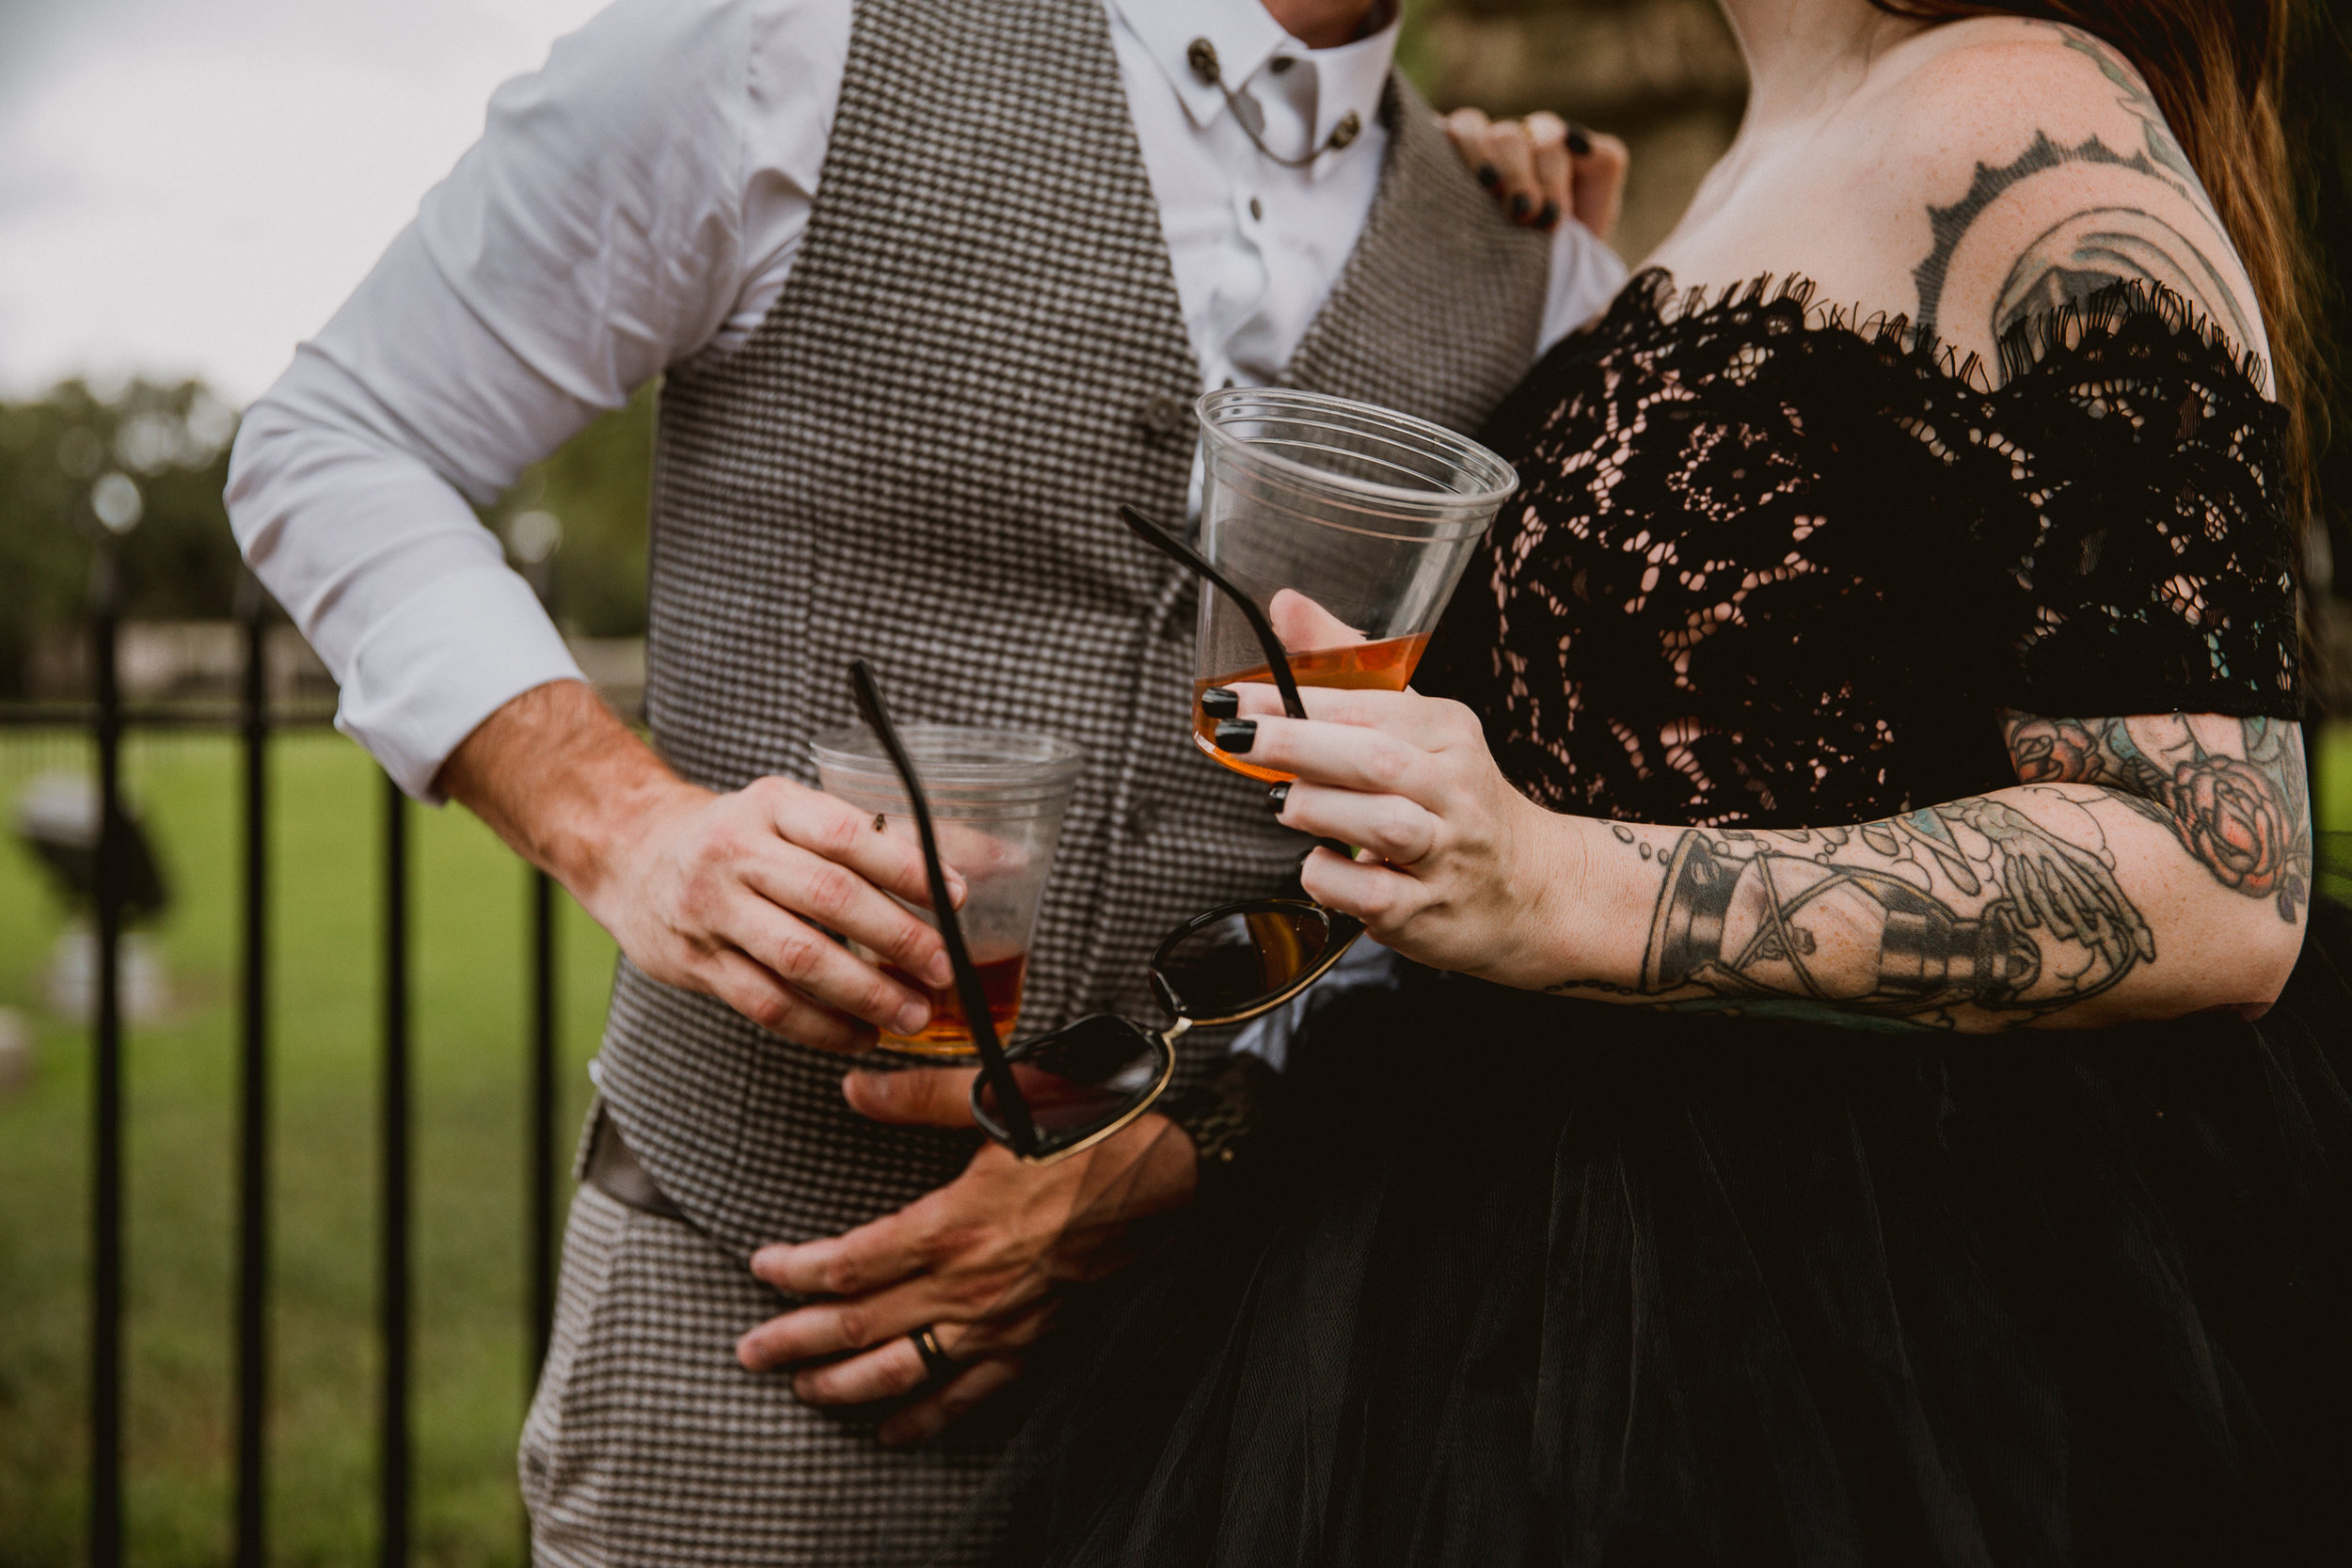 bohemian-hotel-savannah-elopement-kelley-raye-atlanta-wedding-photographer-94.jpg